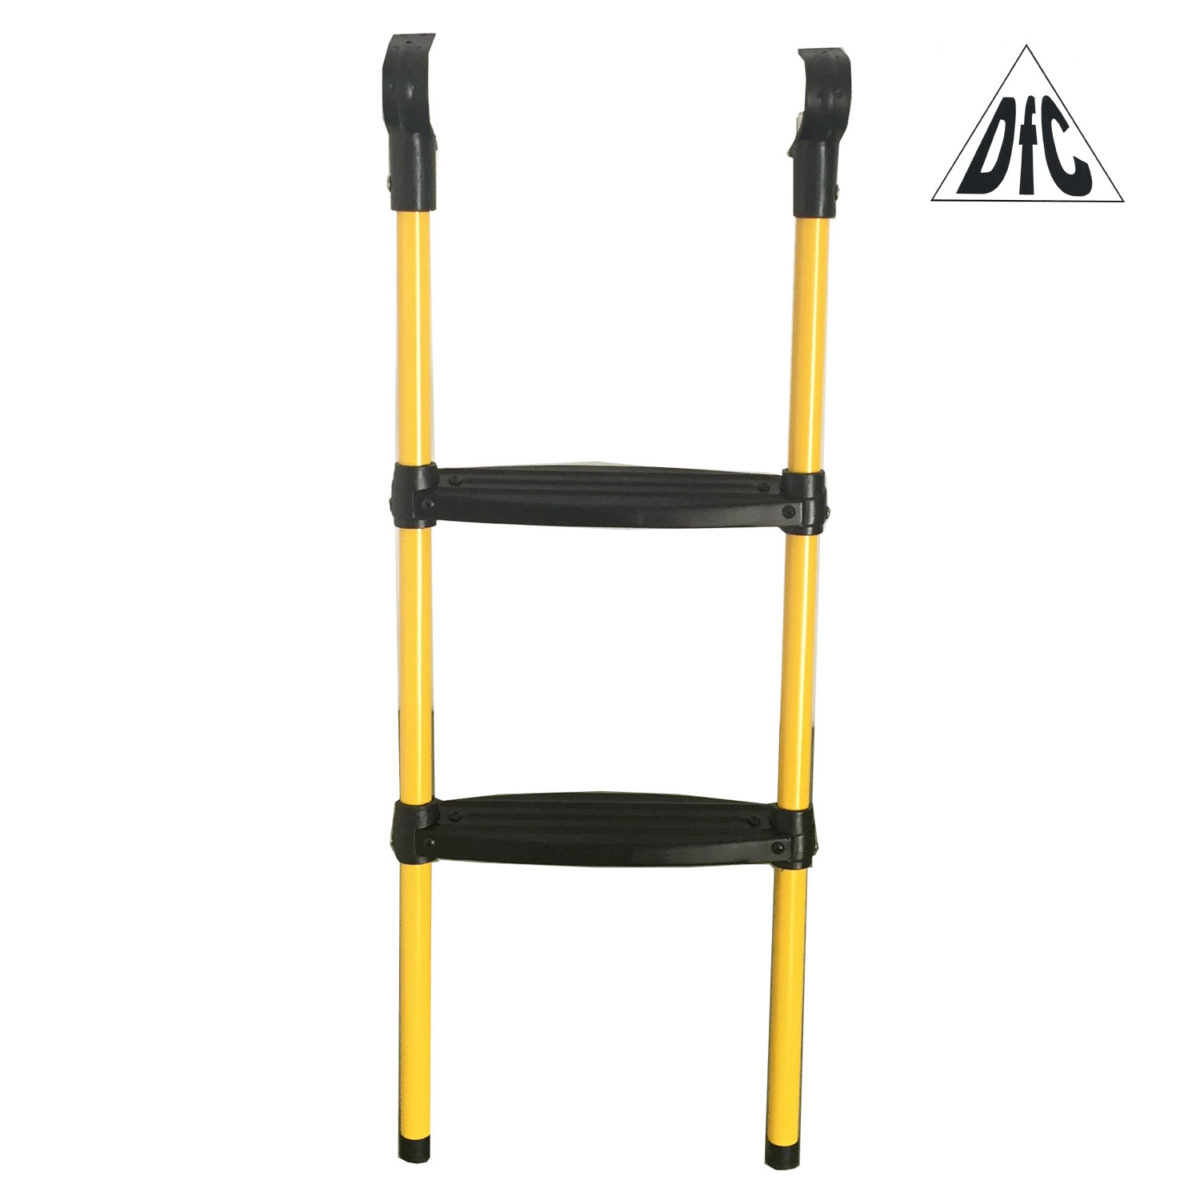 DFC Лестница для батута 6-10 футов (2ступ.) желтый  3STY6-10 - 1